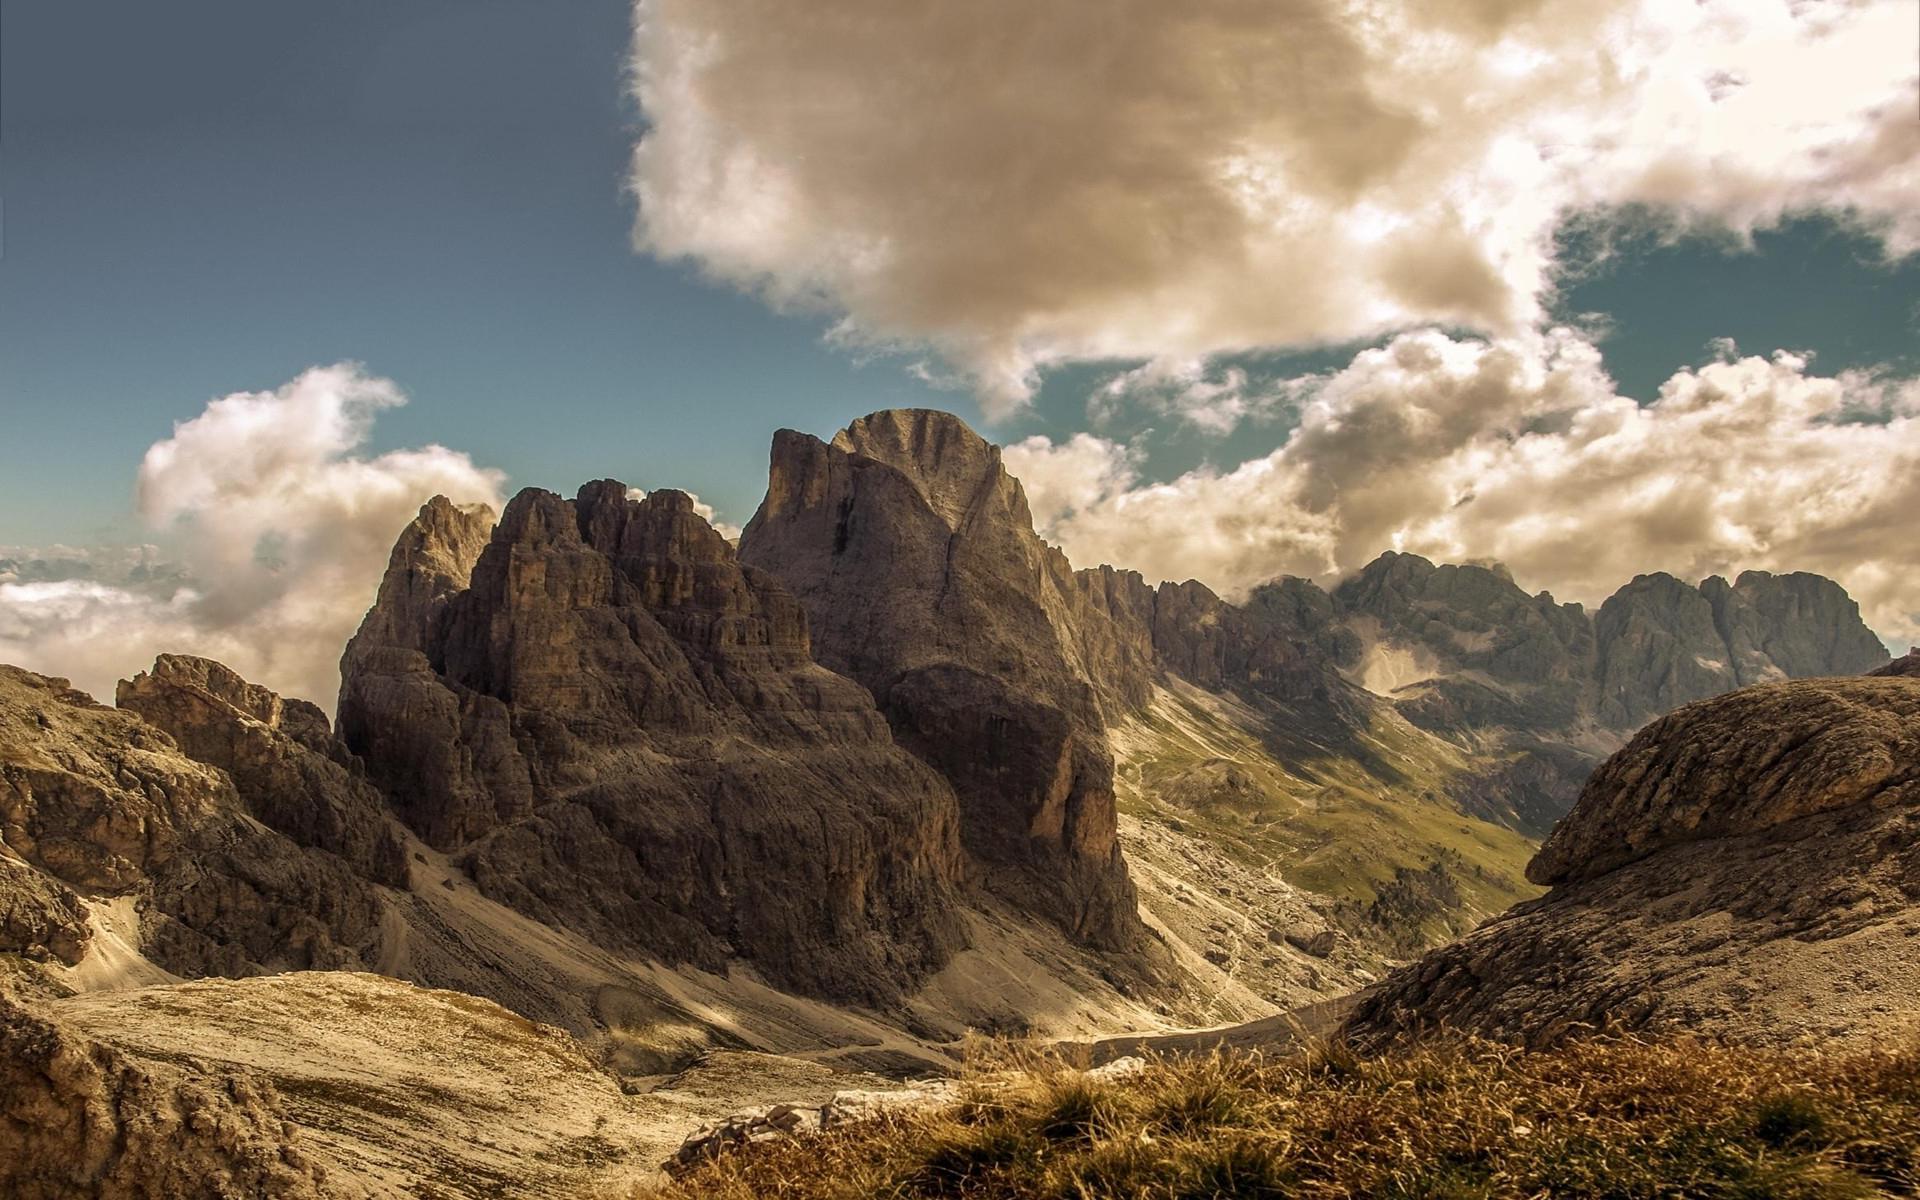 Mountain valley scenery